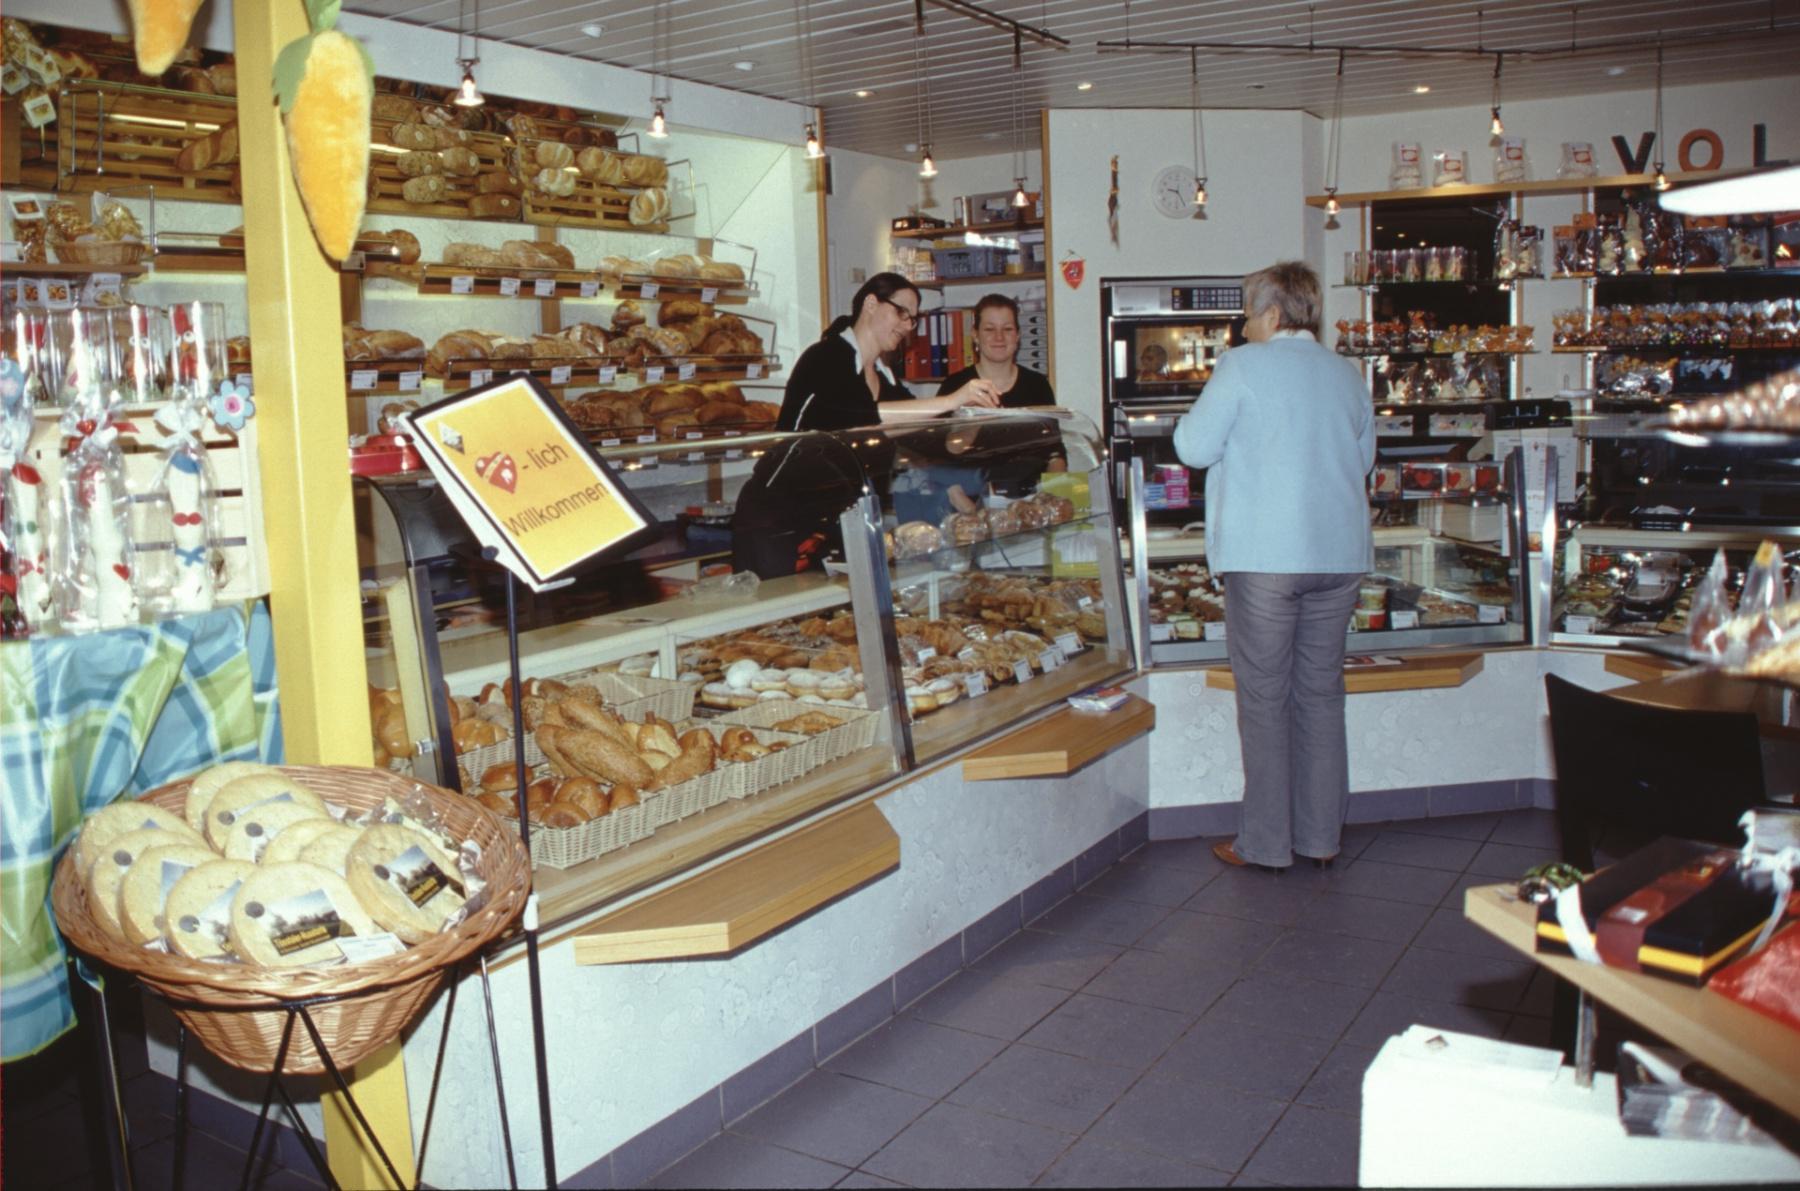 Café-Konditorei- Bäckerei, Voland Broschüre Fassnacht